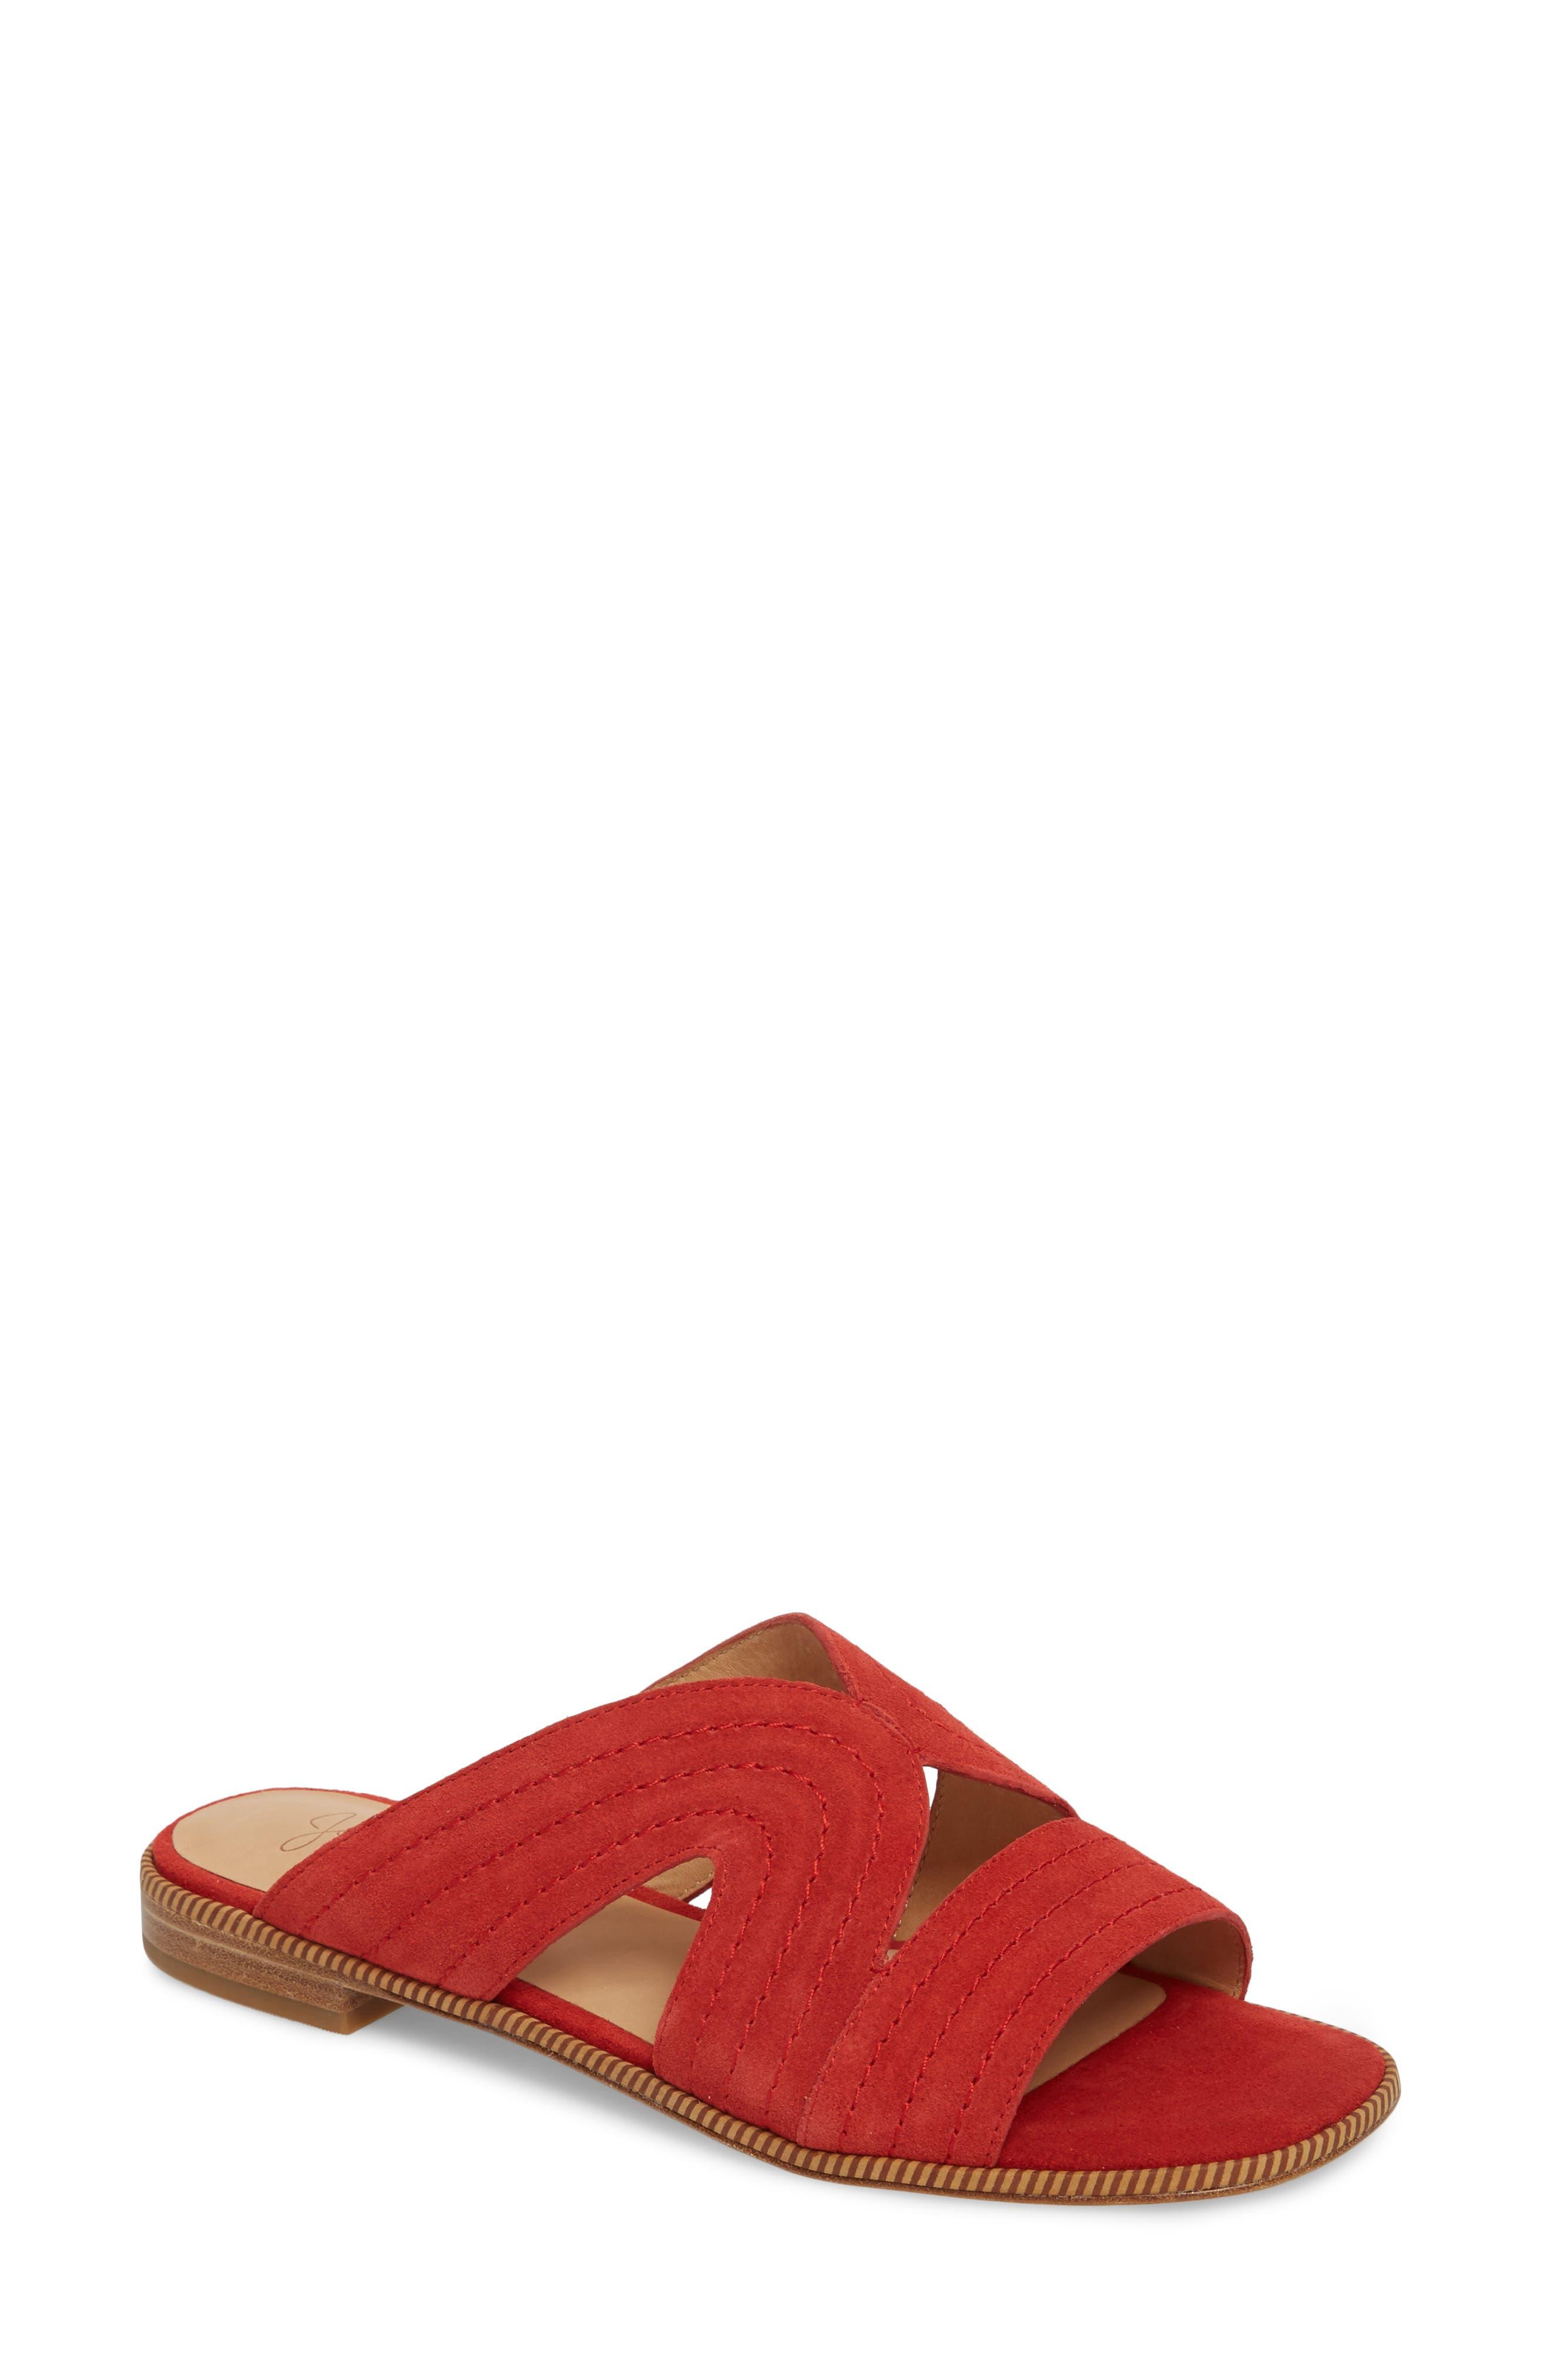 Paetyn Slide Sandal,                             Main thumbnail 1, color,                             Red